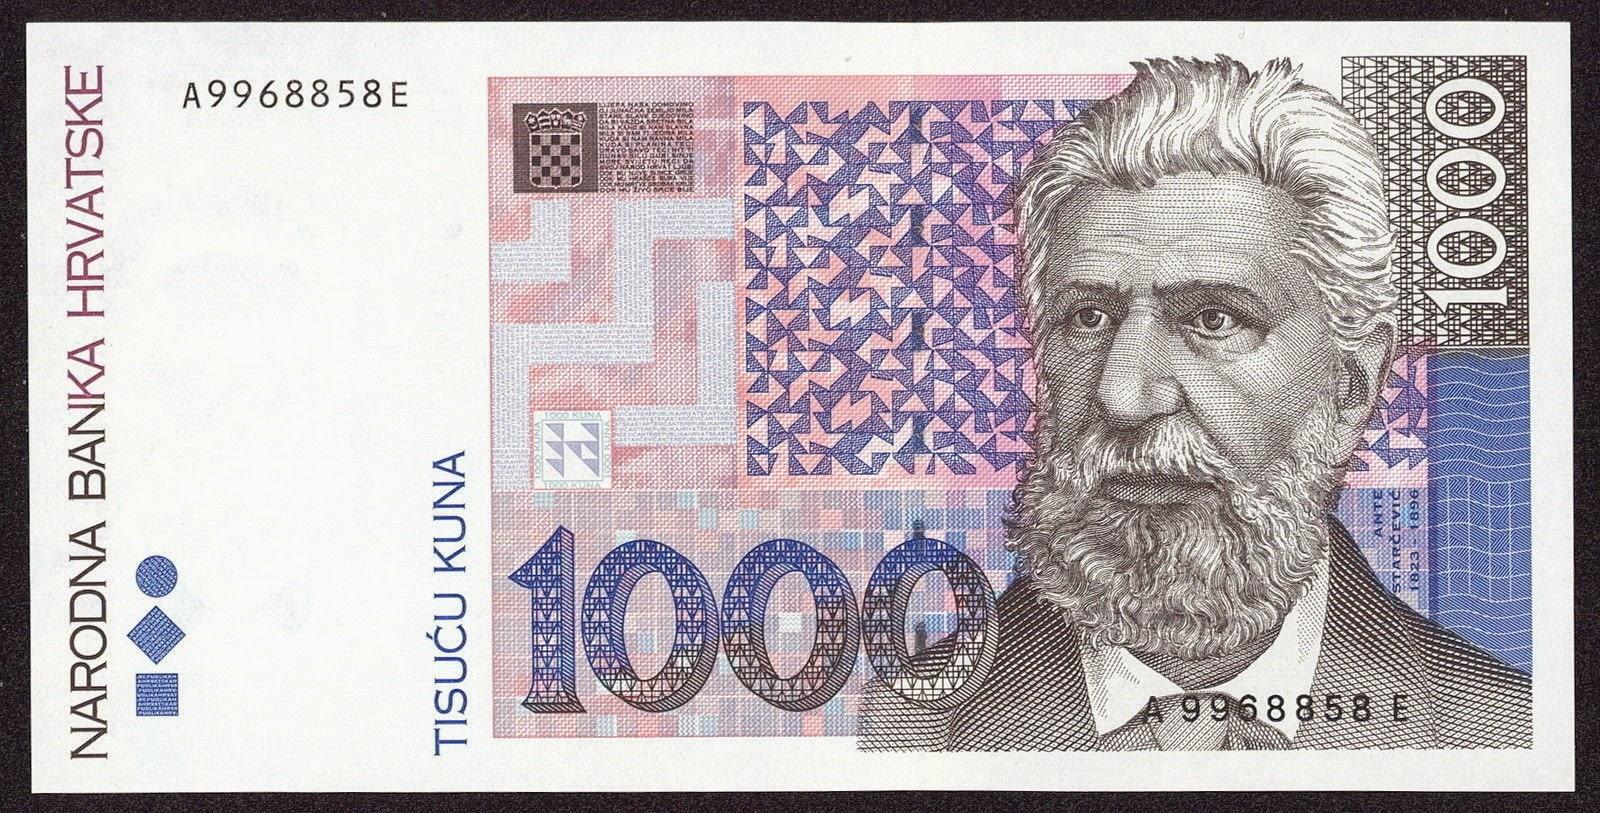 croatia_1000_kuna_banknote.JPG